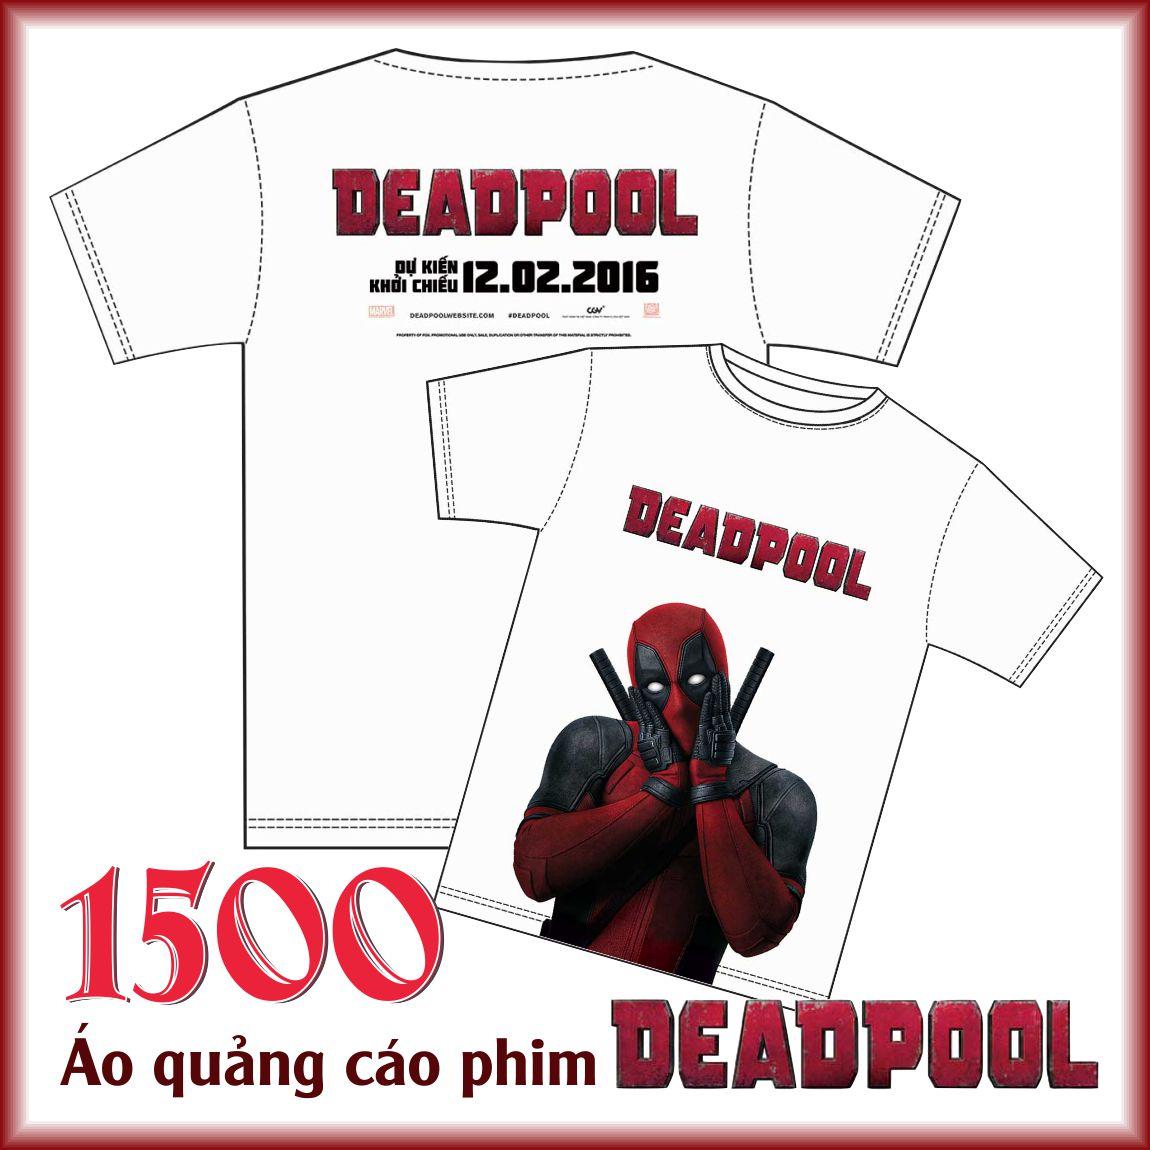 3.Deadpool